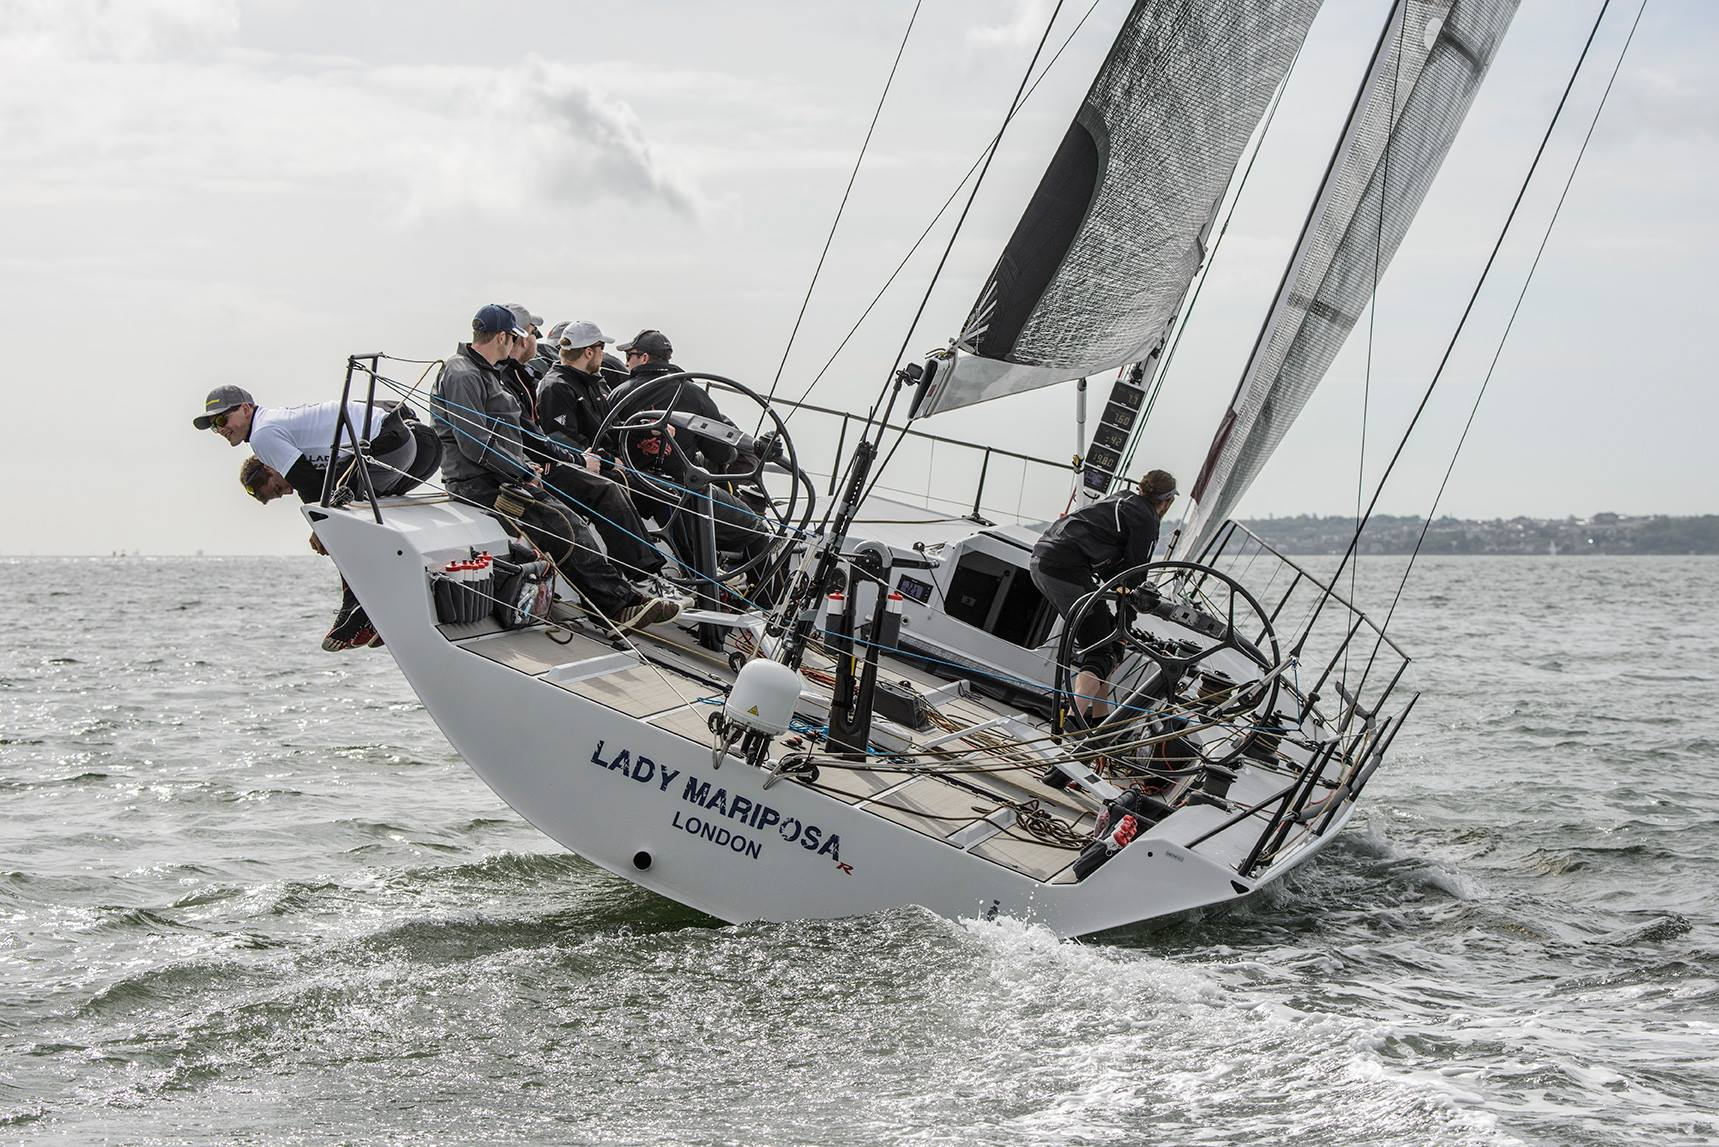 Lady_Mariposa_Racing_ RORC_North_Sea_regatta_2017_5.jpg